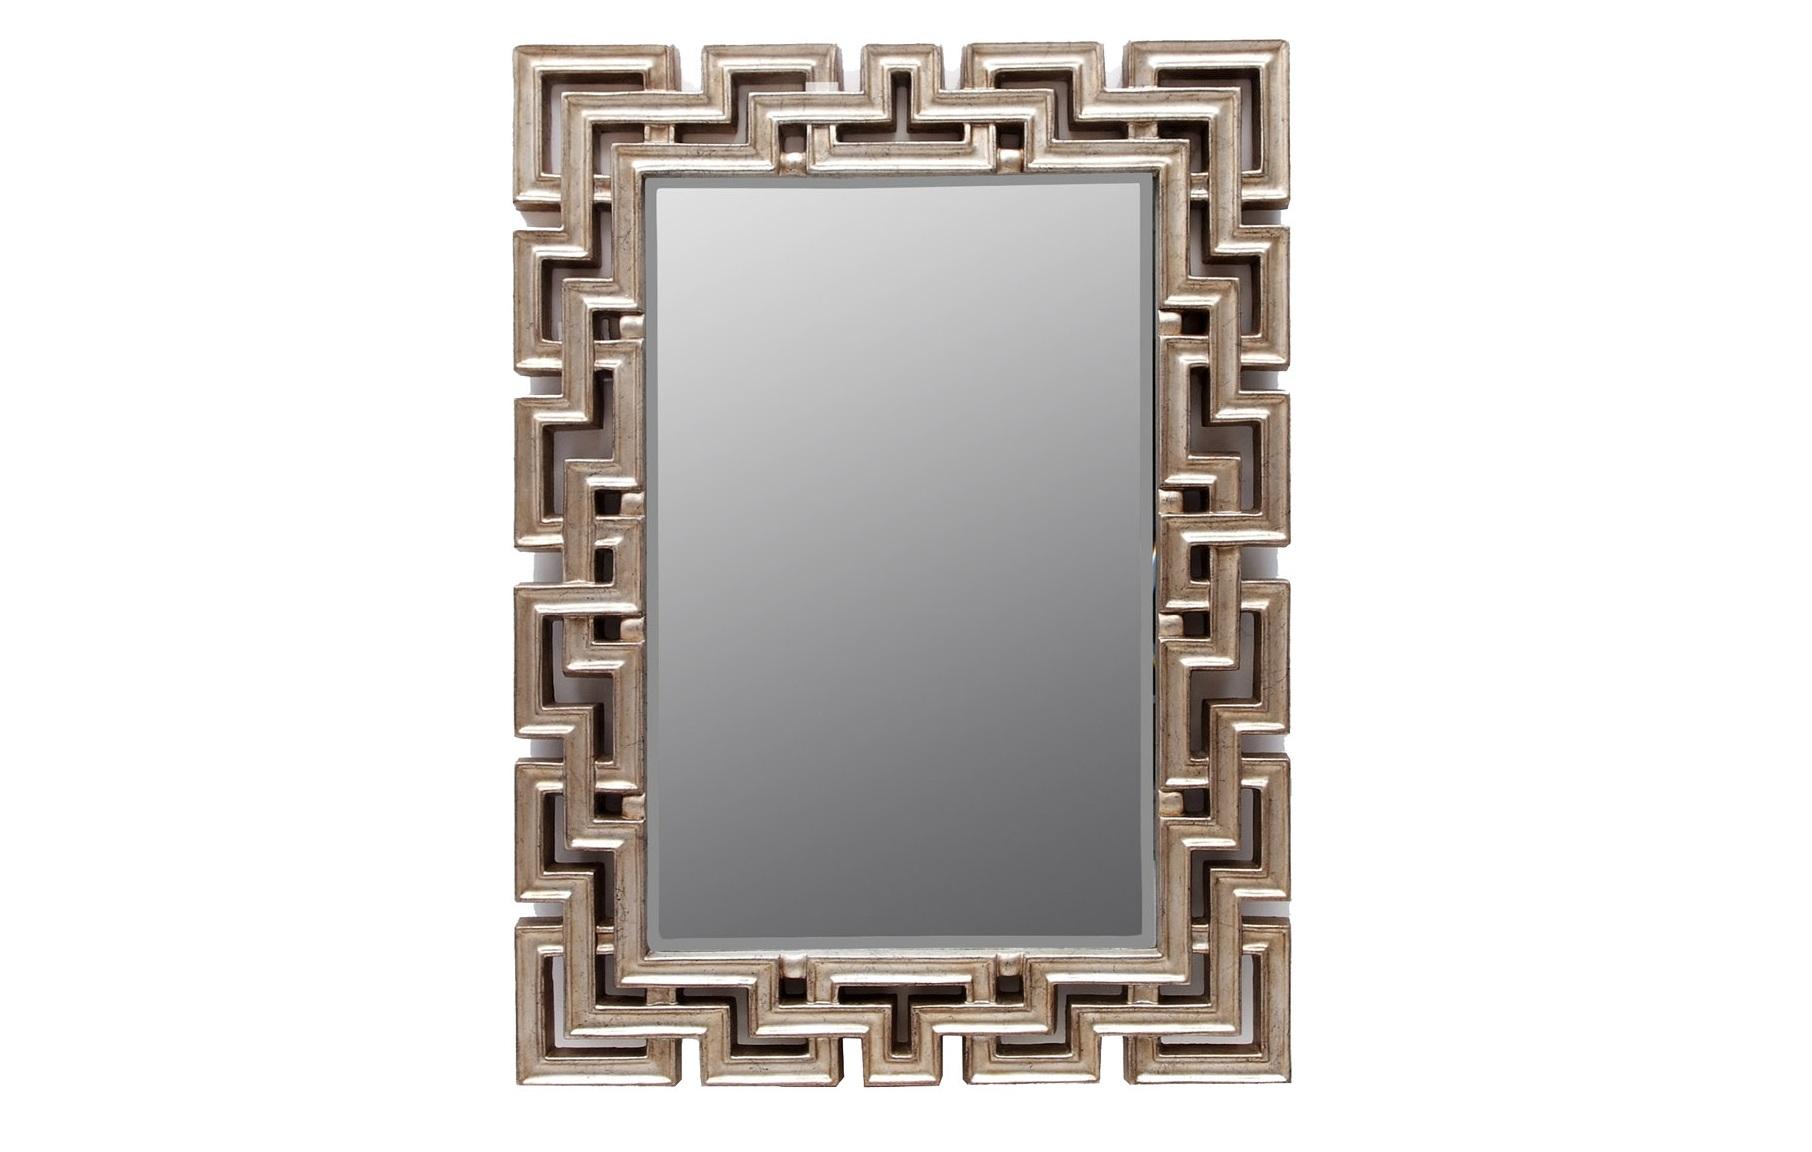 ЗеркалоНастенные зеркала<br><br><br>Material: Металл<br>Length см: None<br>Width см: 90<br>Depth см: 10<br>Height см: 120